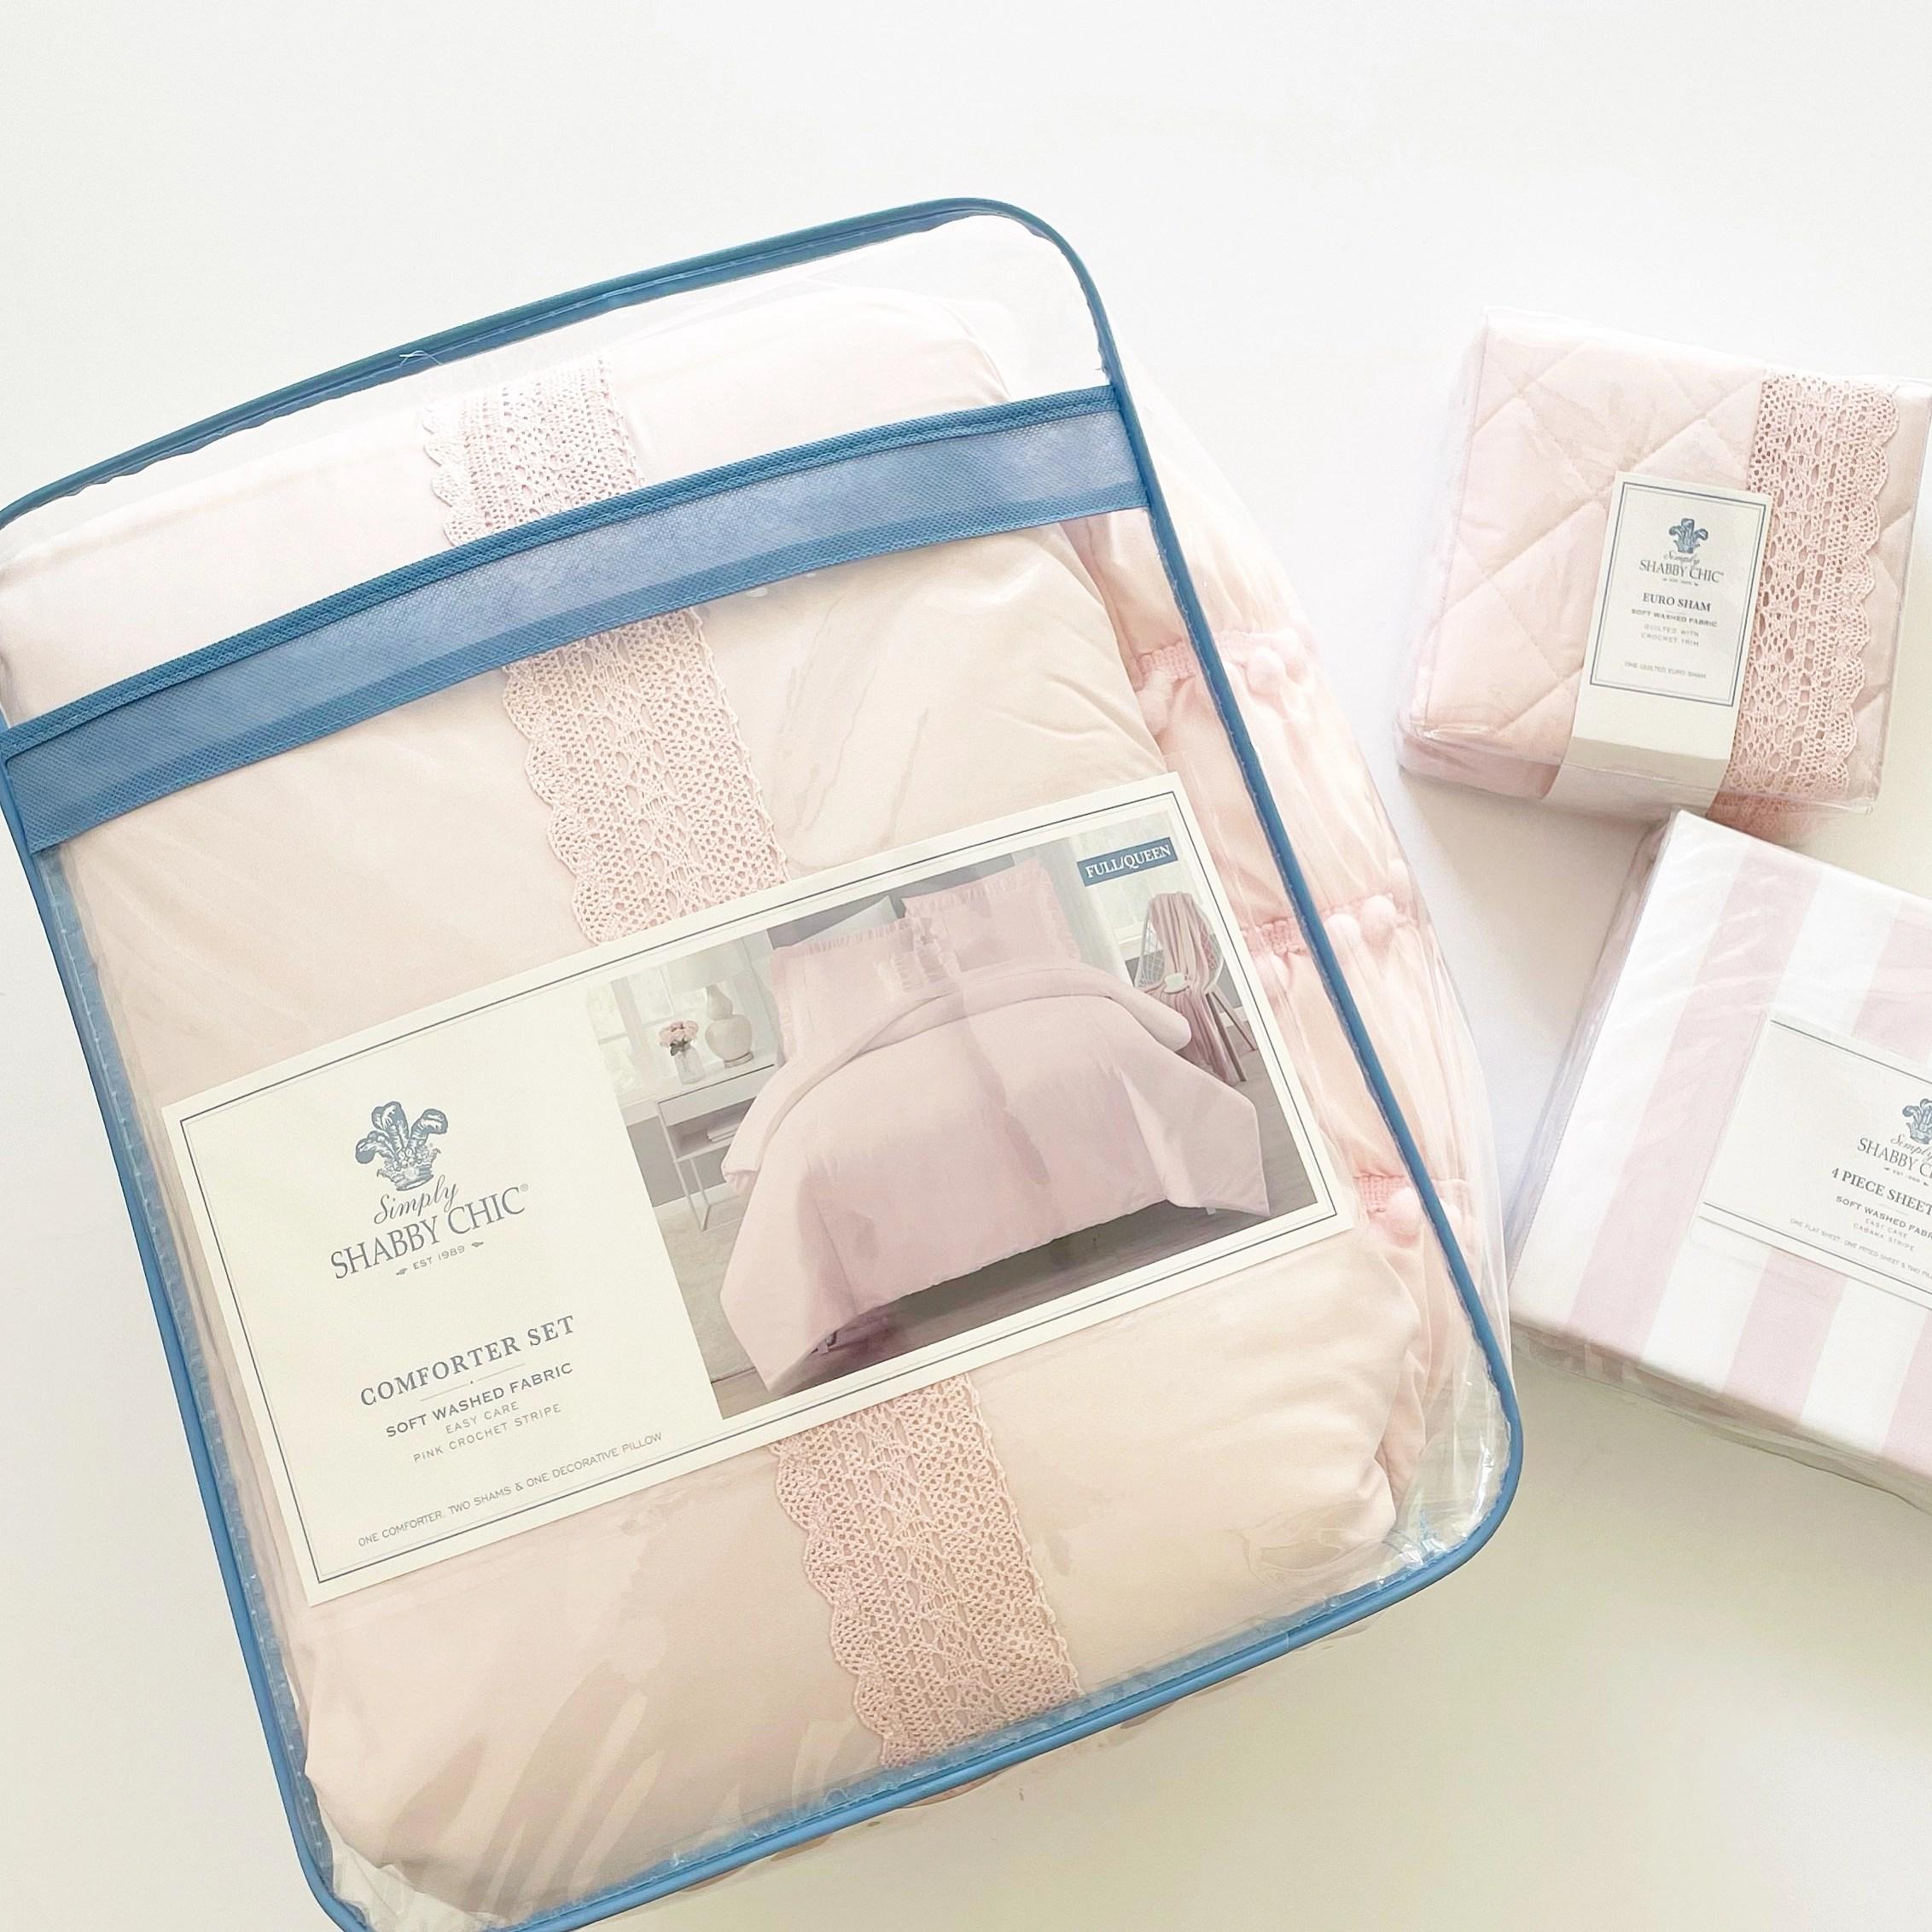 Simply Shabby Chic Reversible Crochet Comforter Set, Euro Sham and Cabana Stripe Sheet Set